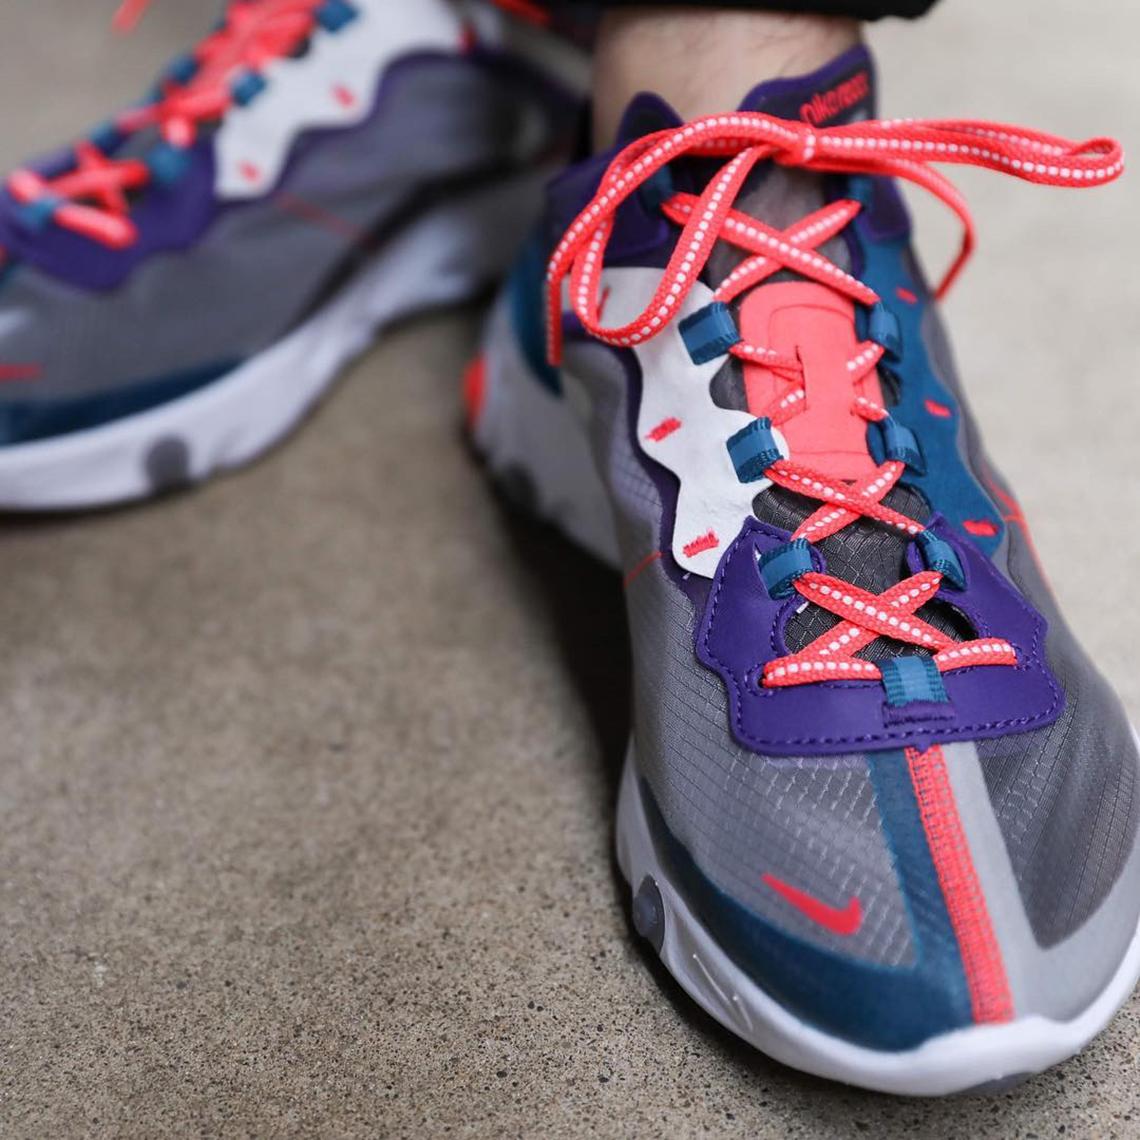 f:id:sneakerscaffetokyo:20190605191132j:plain